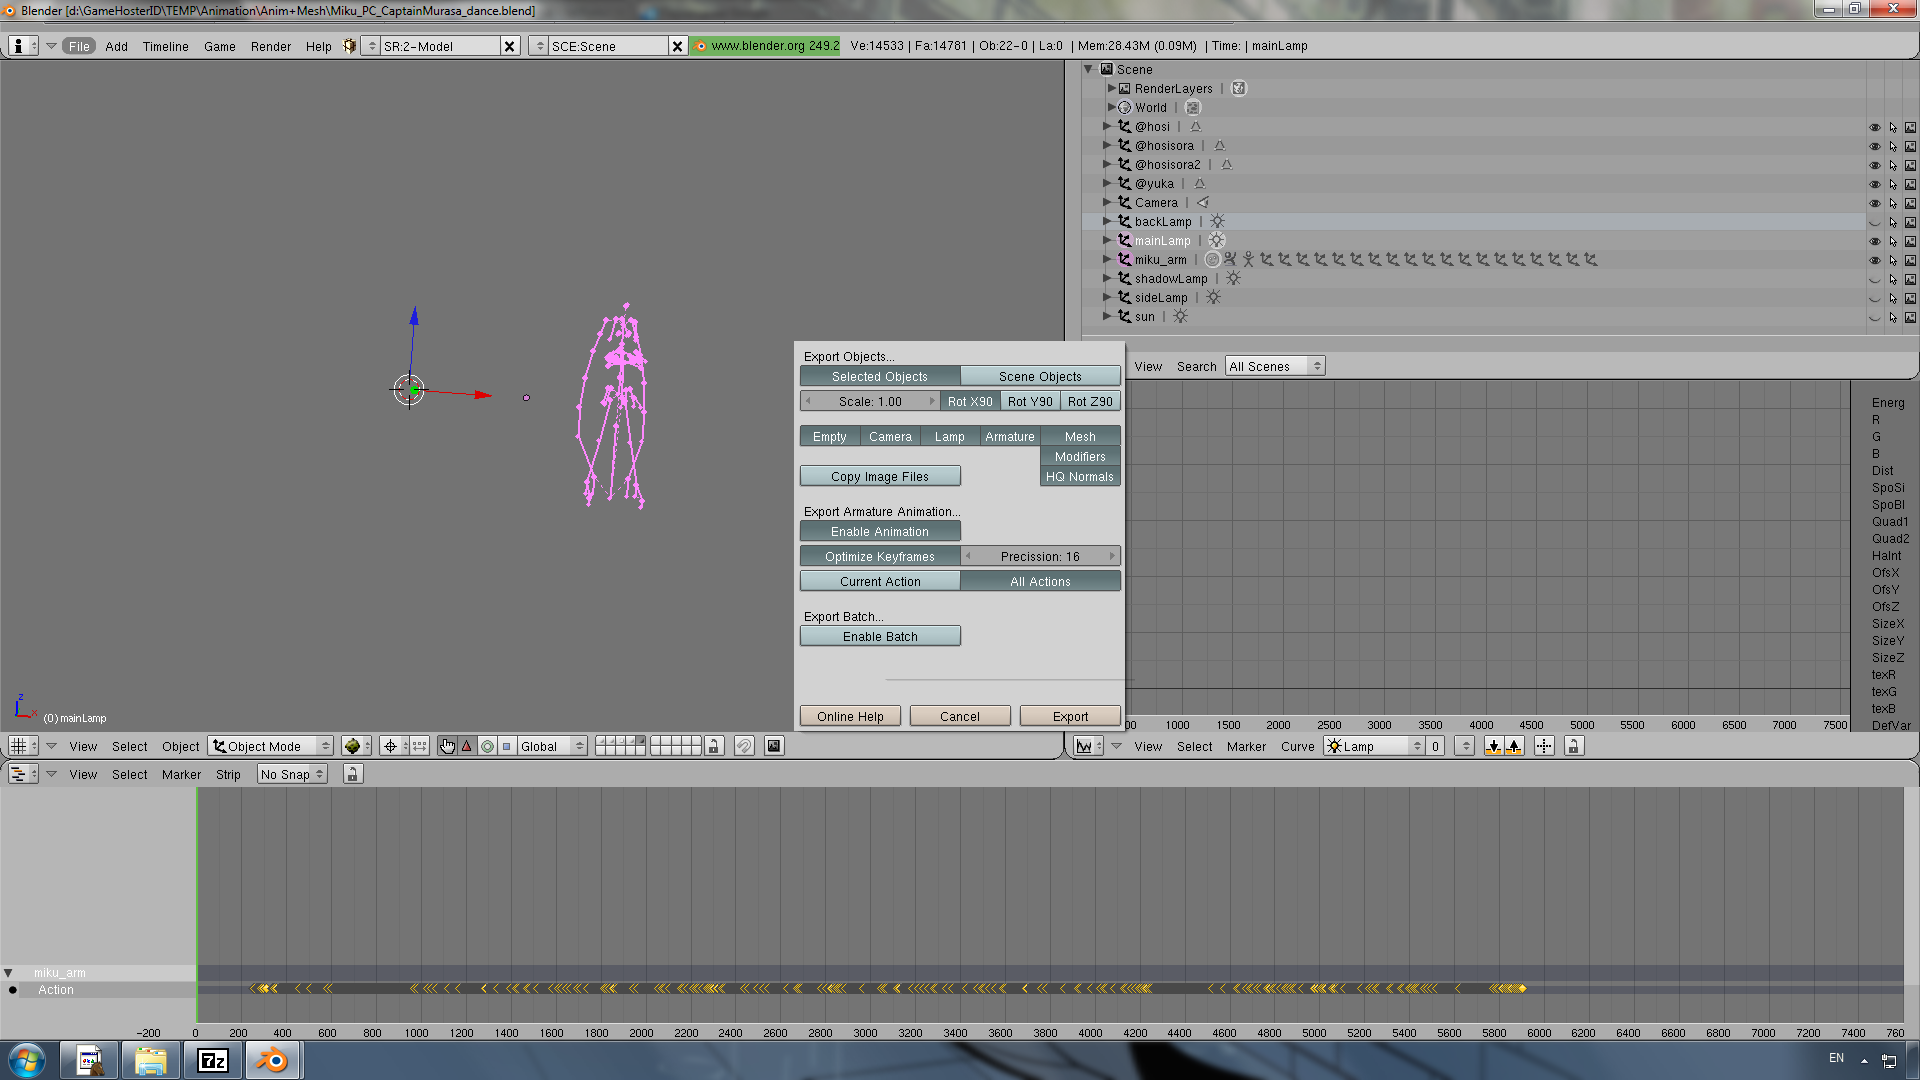 Blender's FBX Import to 3ds max - 3D Animation Talk